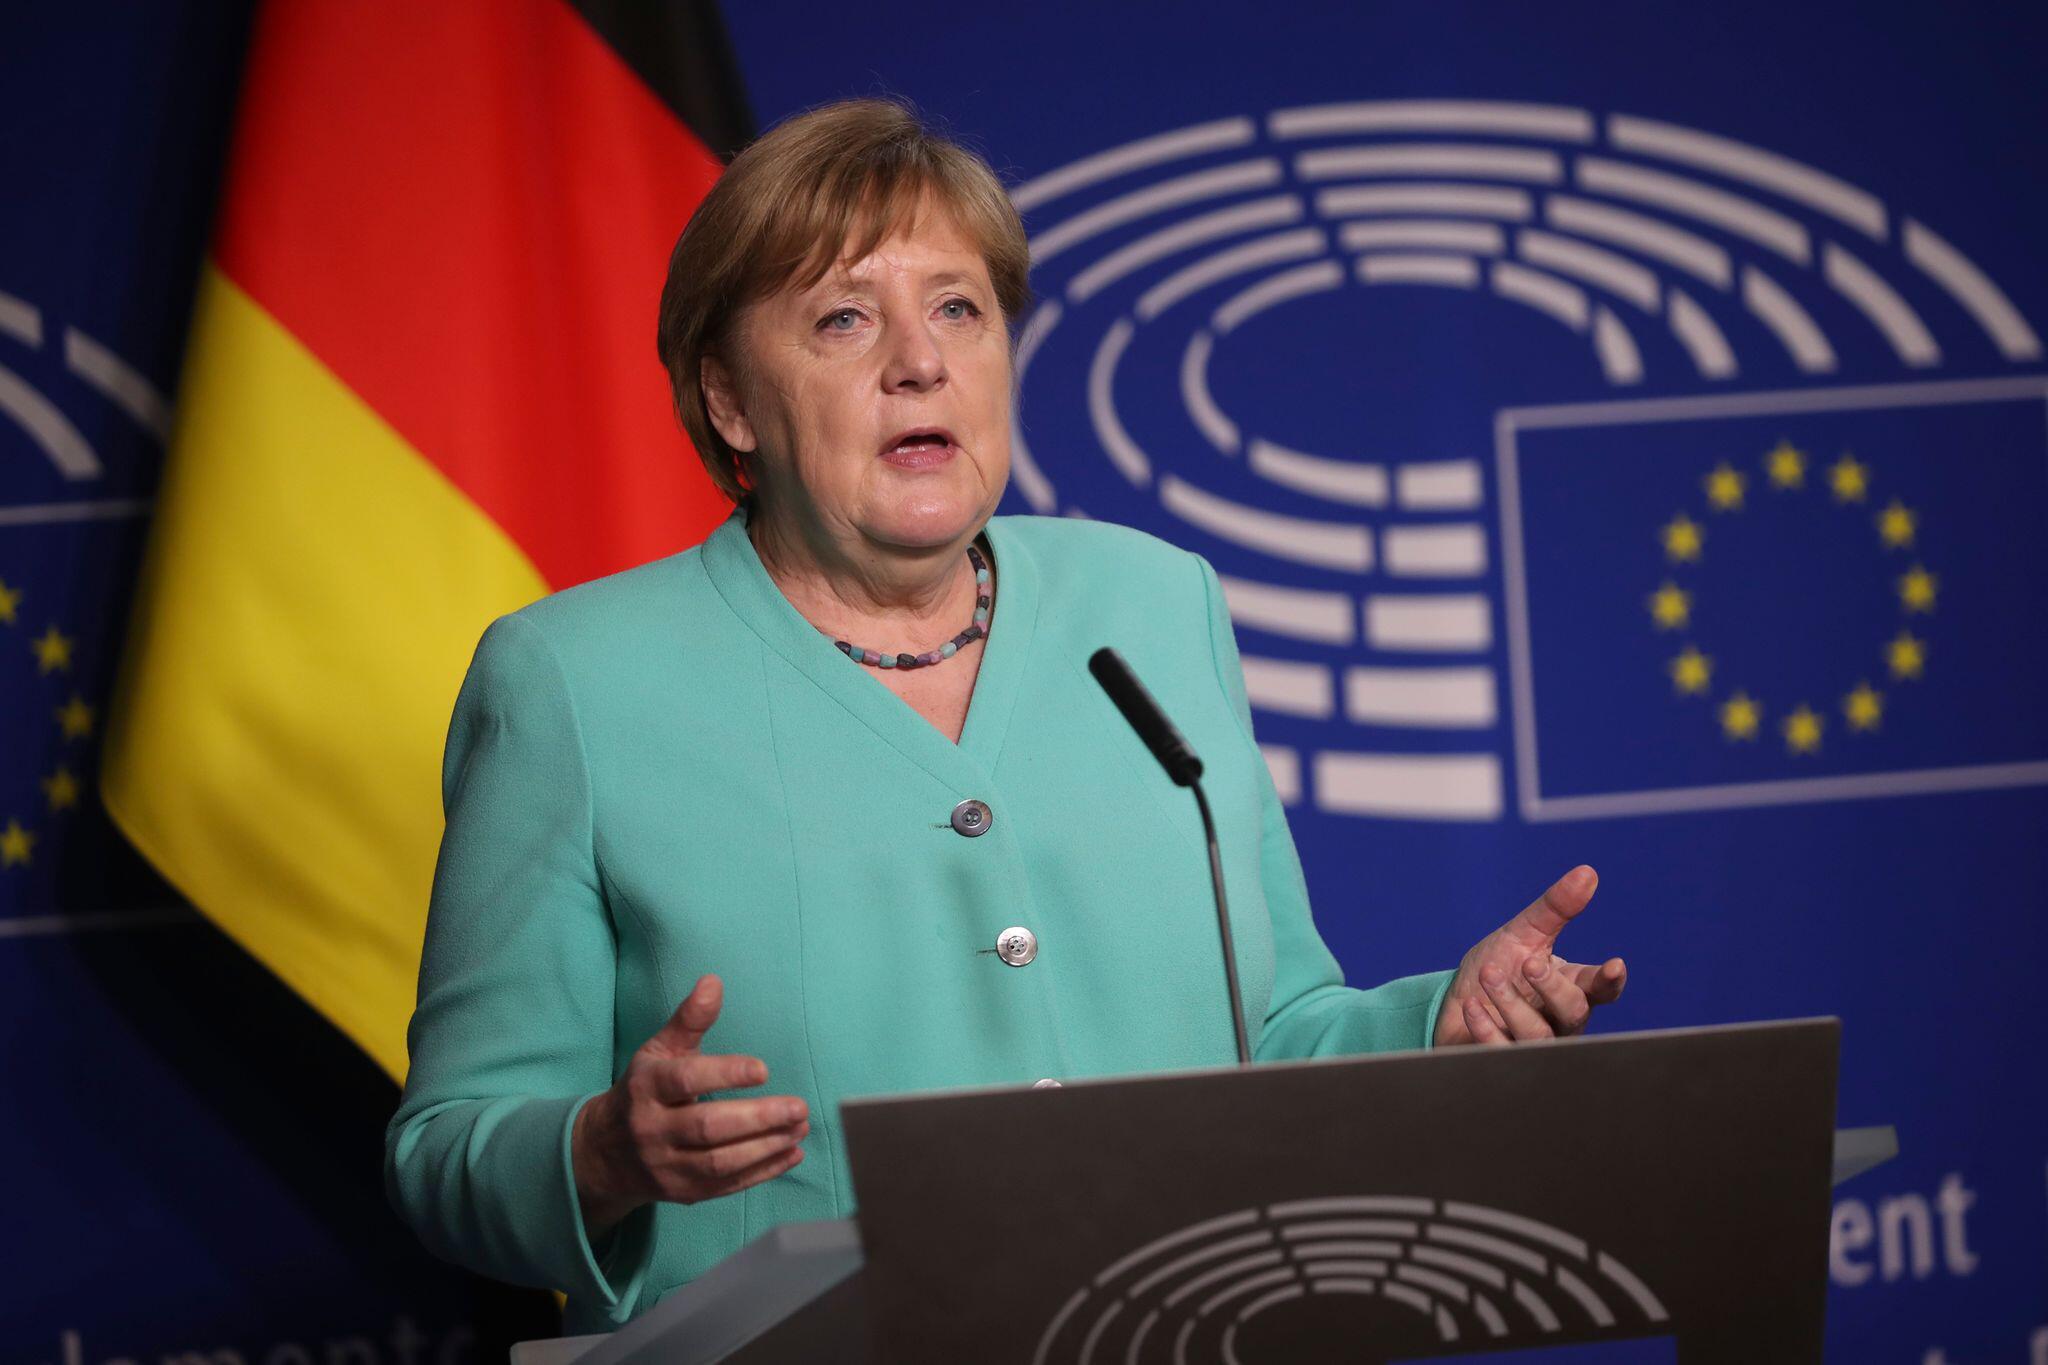 Bild zu EU-Parlament in Brüssel - Bundeskanzlerin Merkel